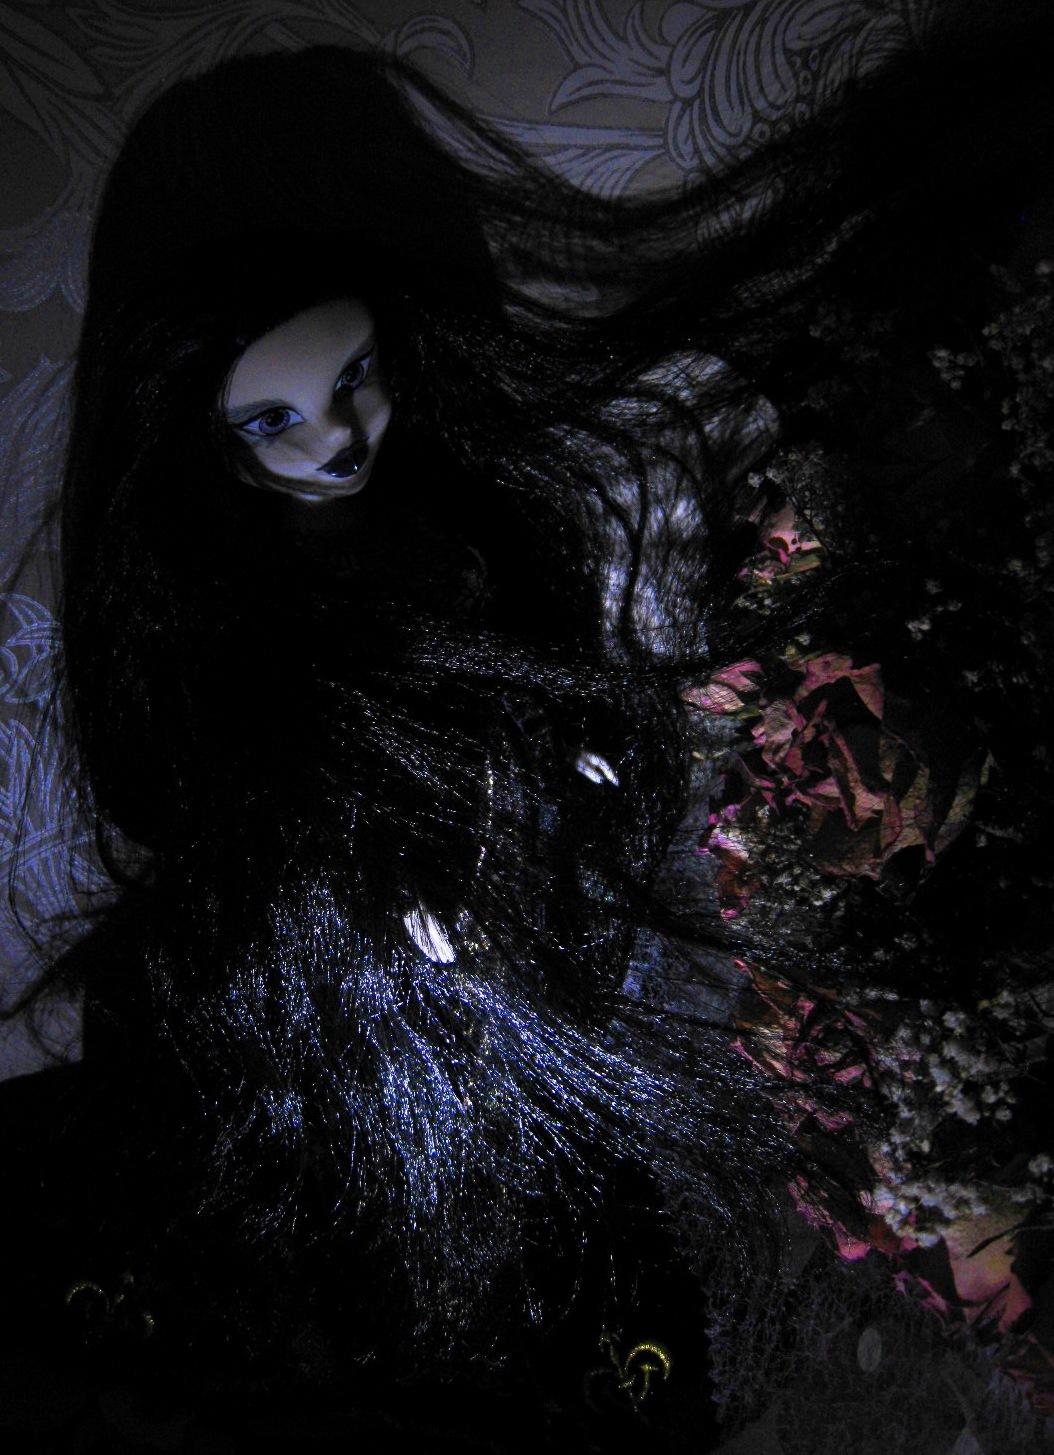 BEgoths - готические куклы Img3194fj